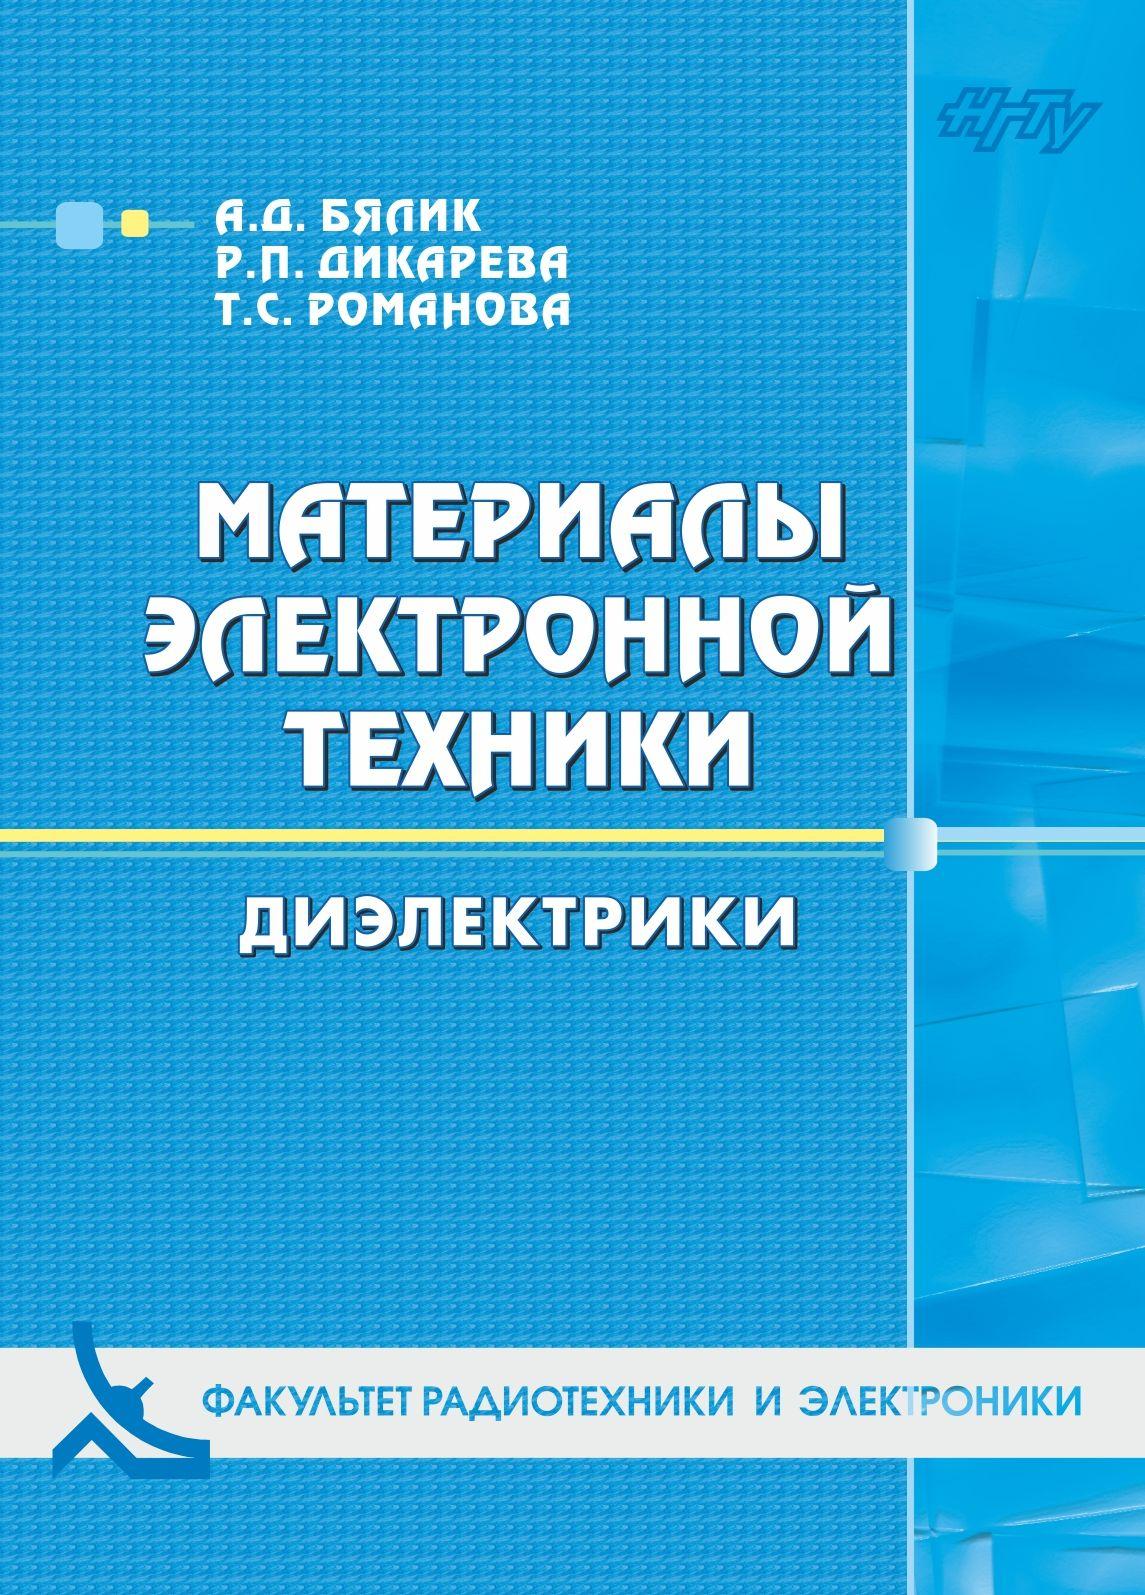 Материалы электронной техники. Диэлектрики